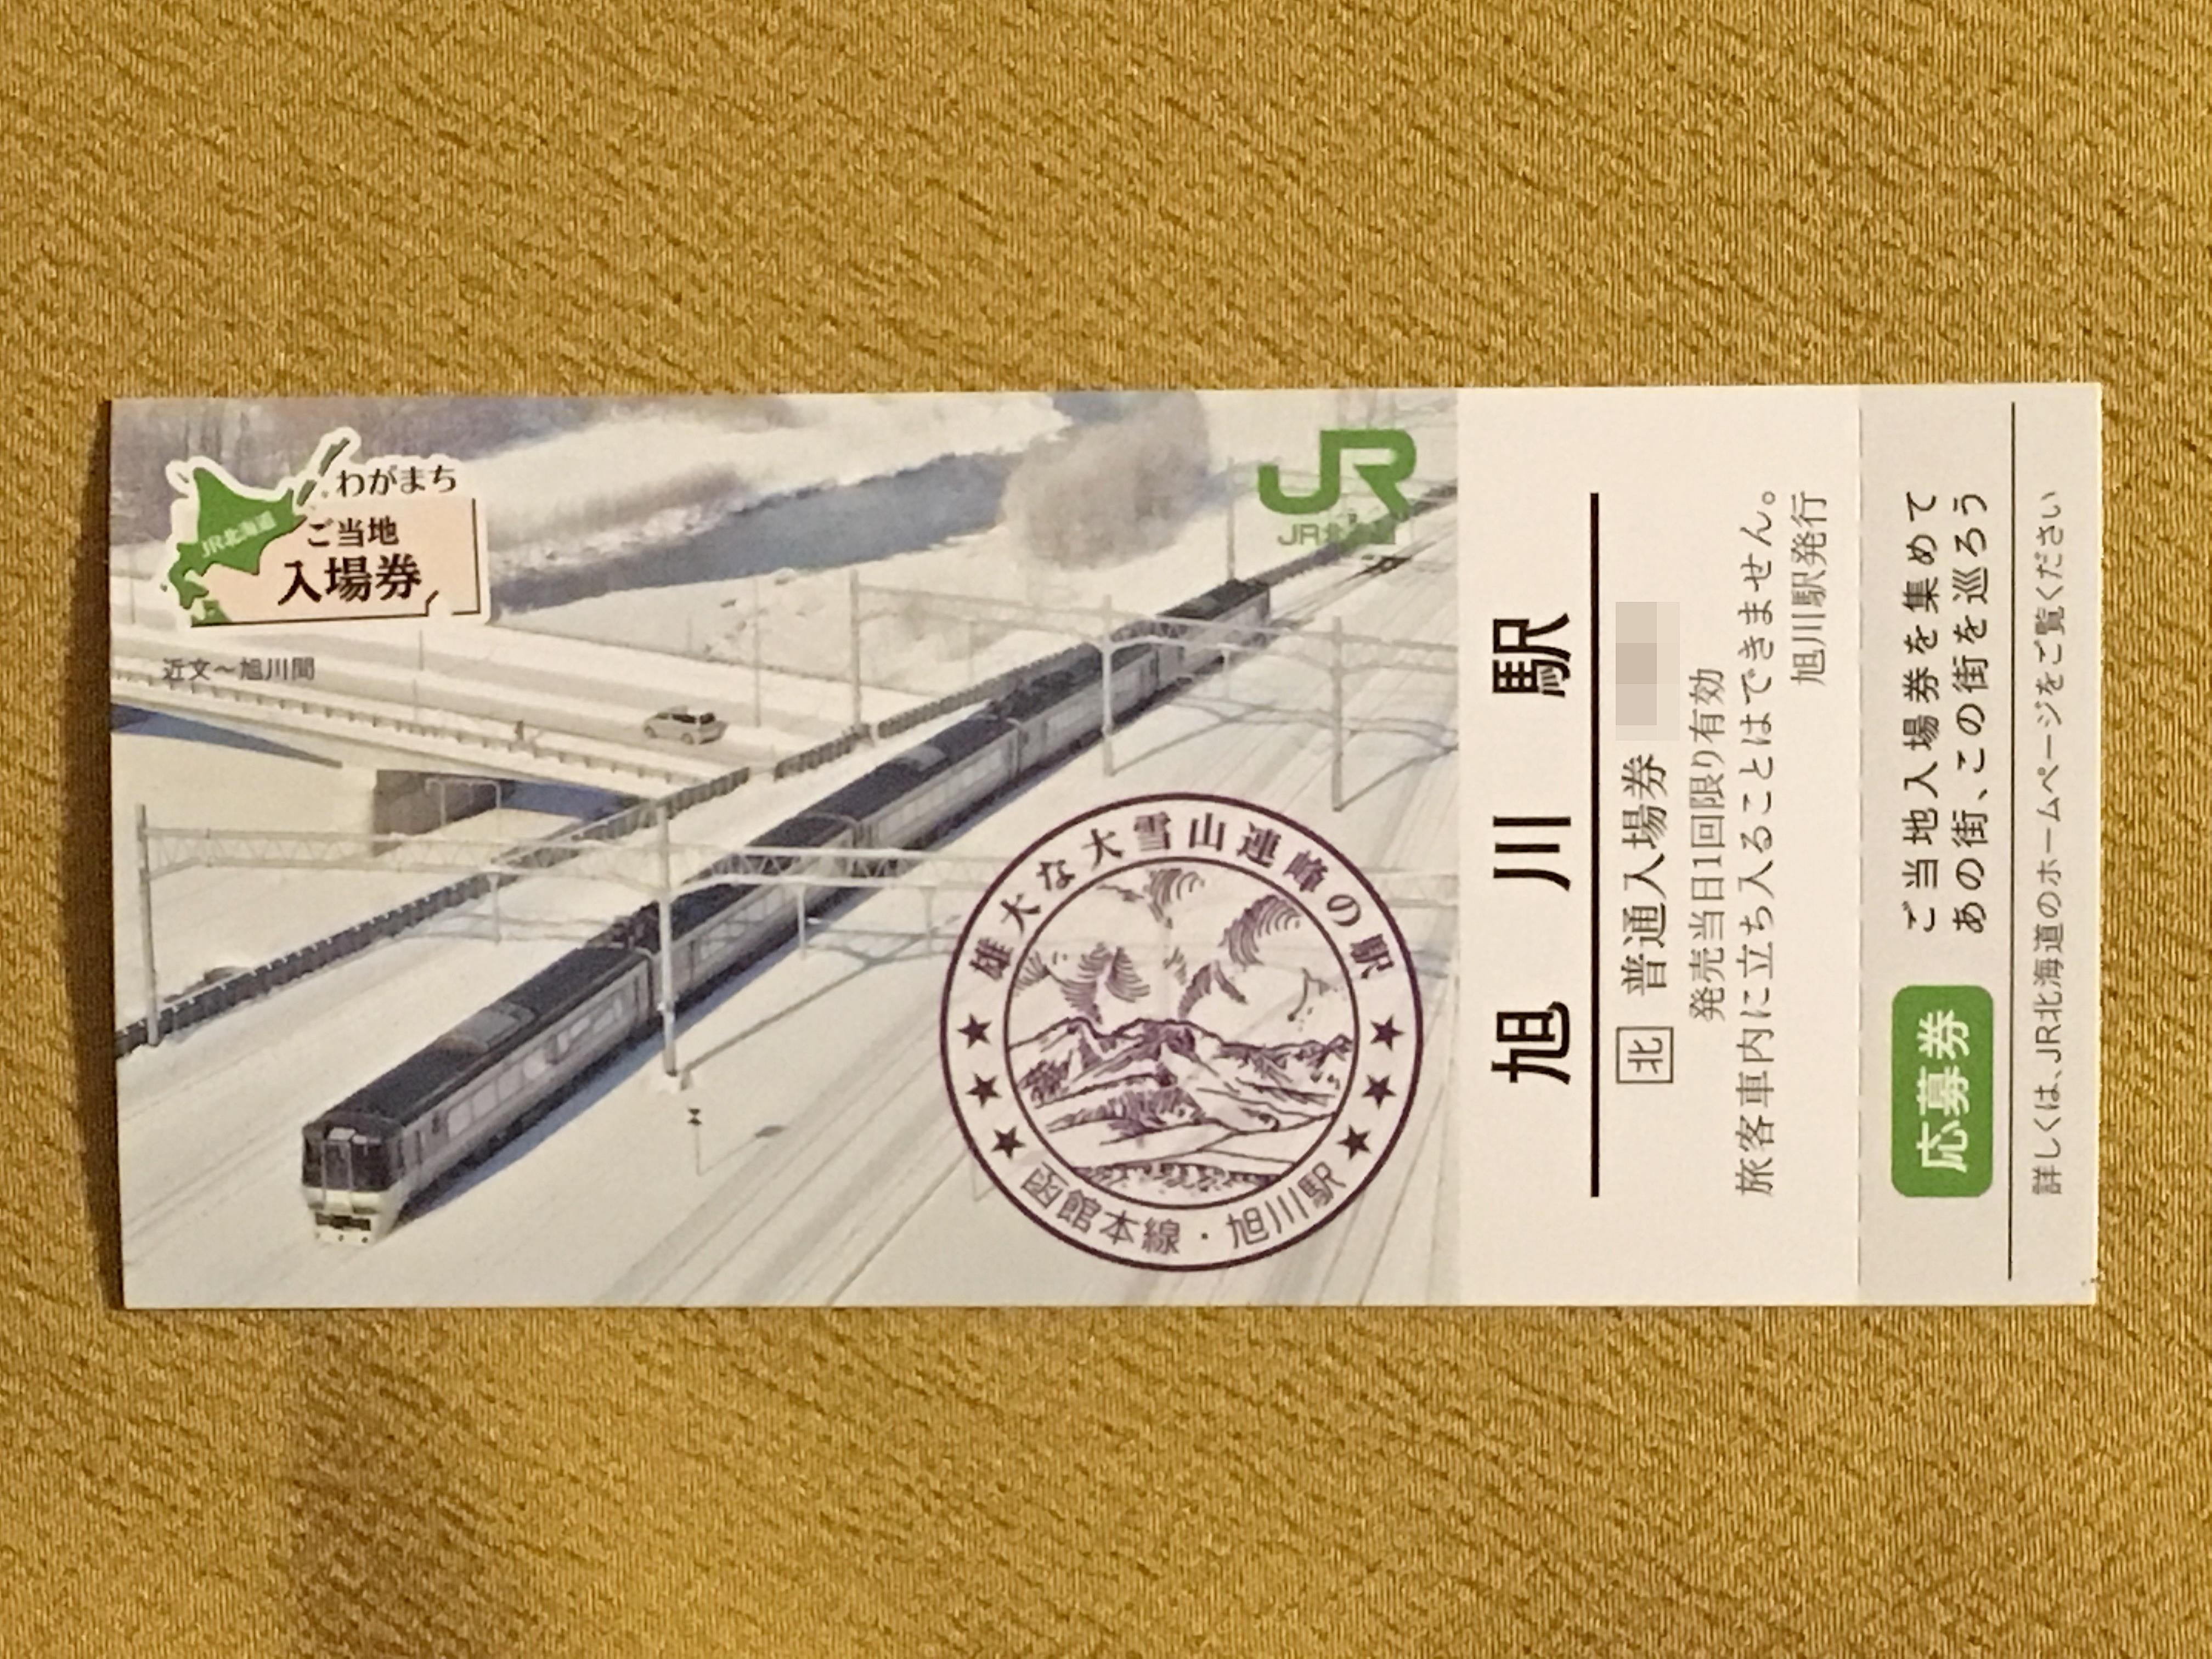 JR北海道ご当地入場券 旭川駅表.JPG